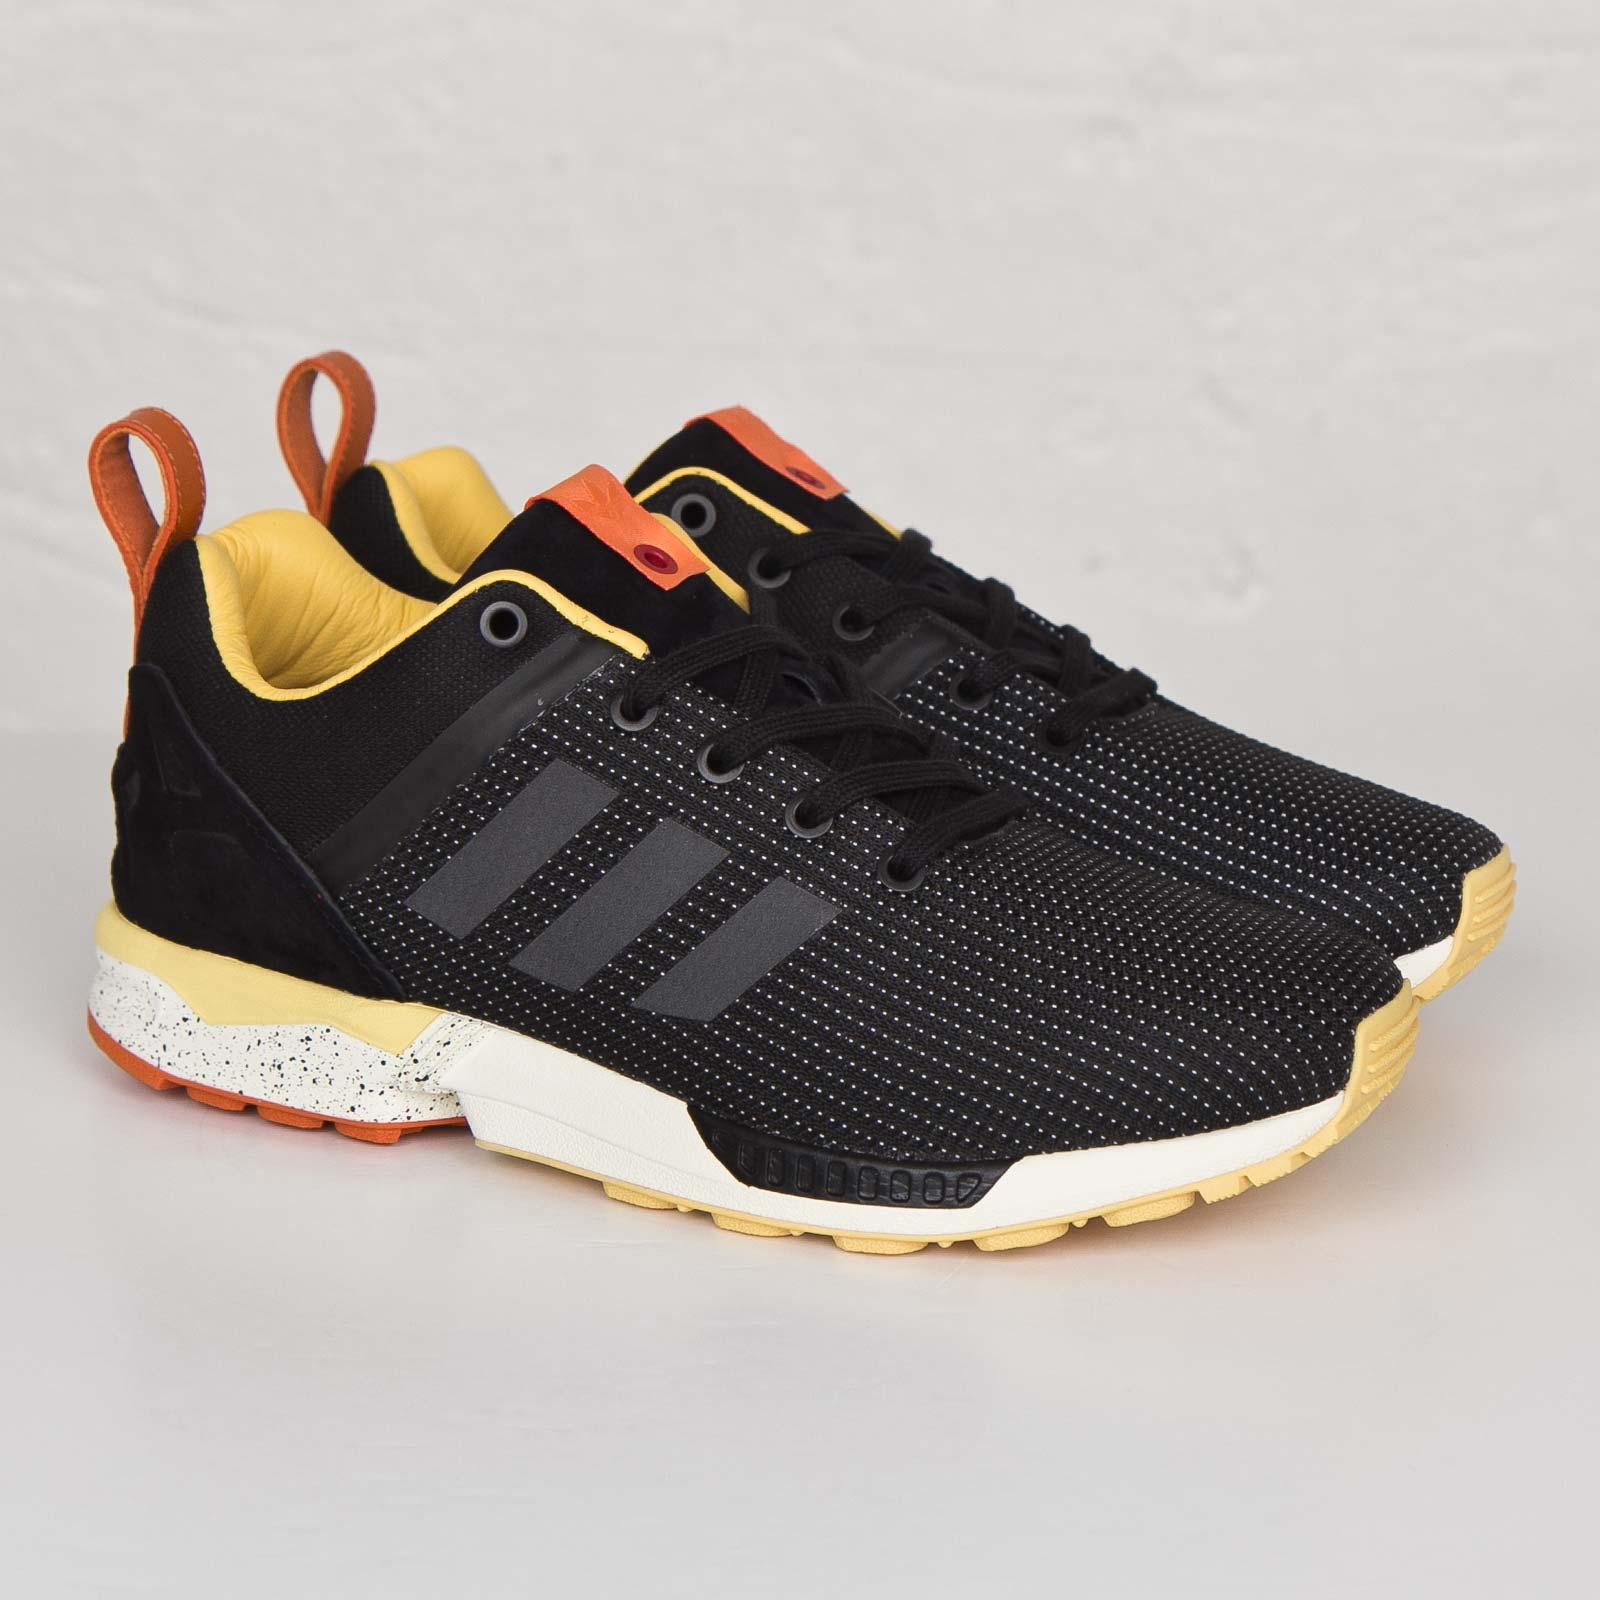 Flusso bdga b25325 scarpe da ginnasticanstuff scarpe adidas zx